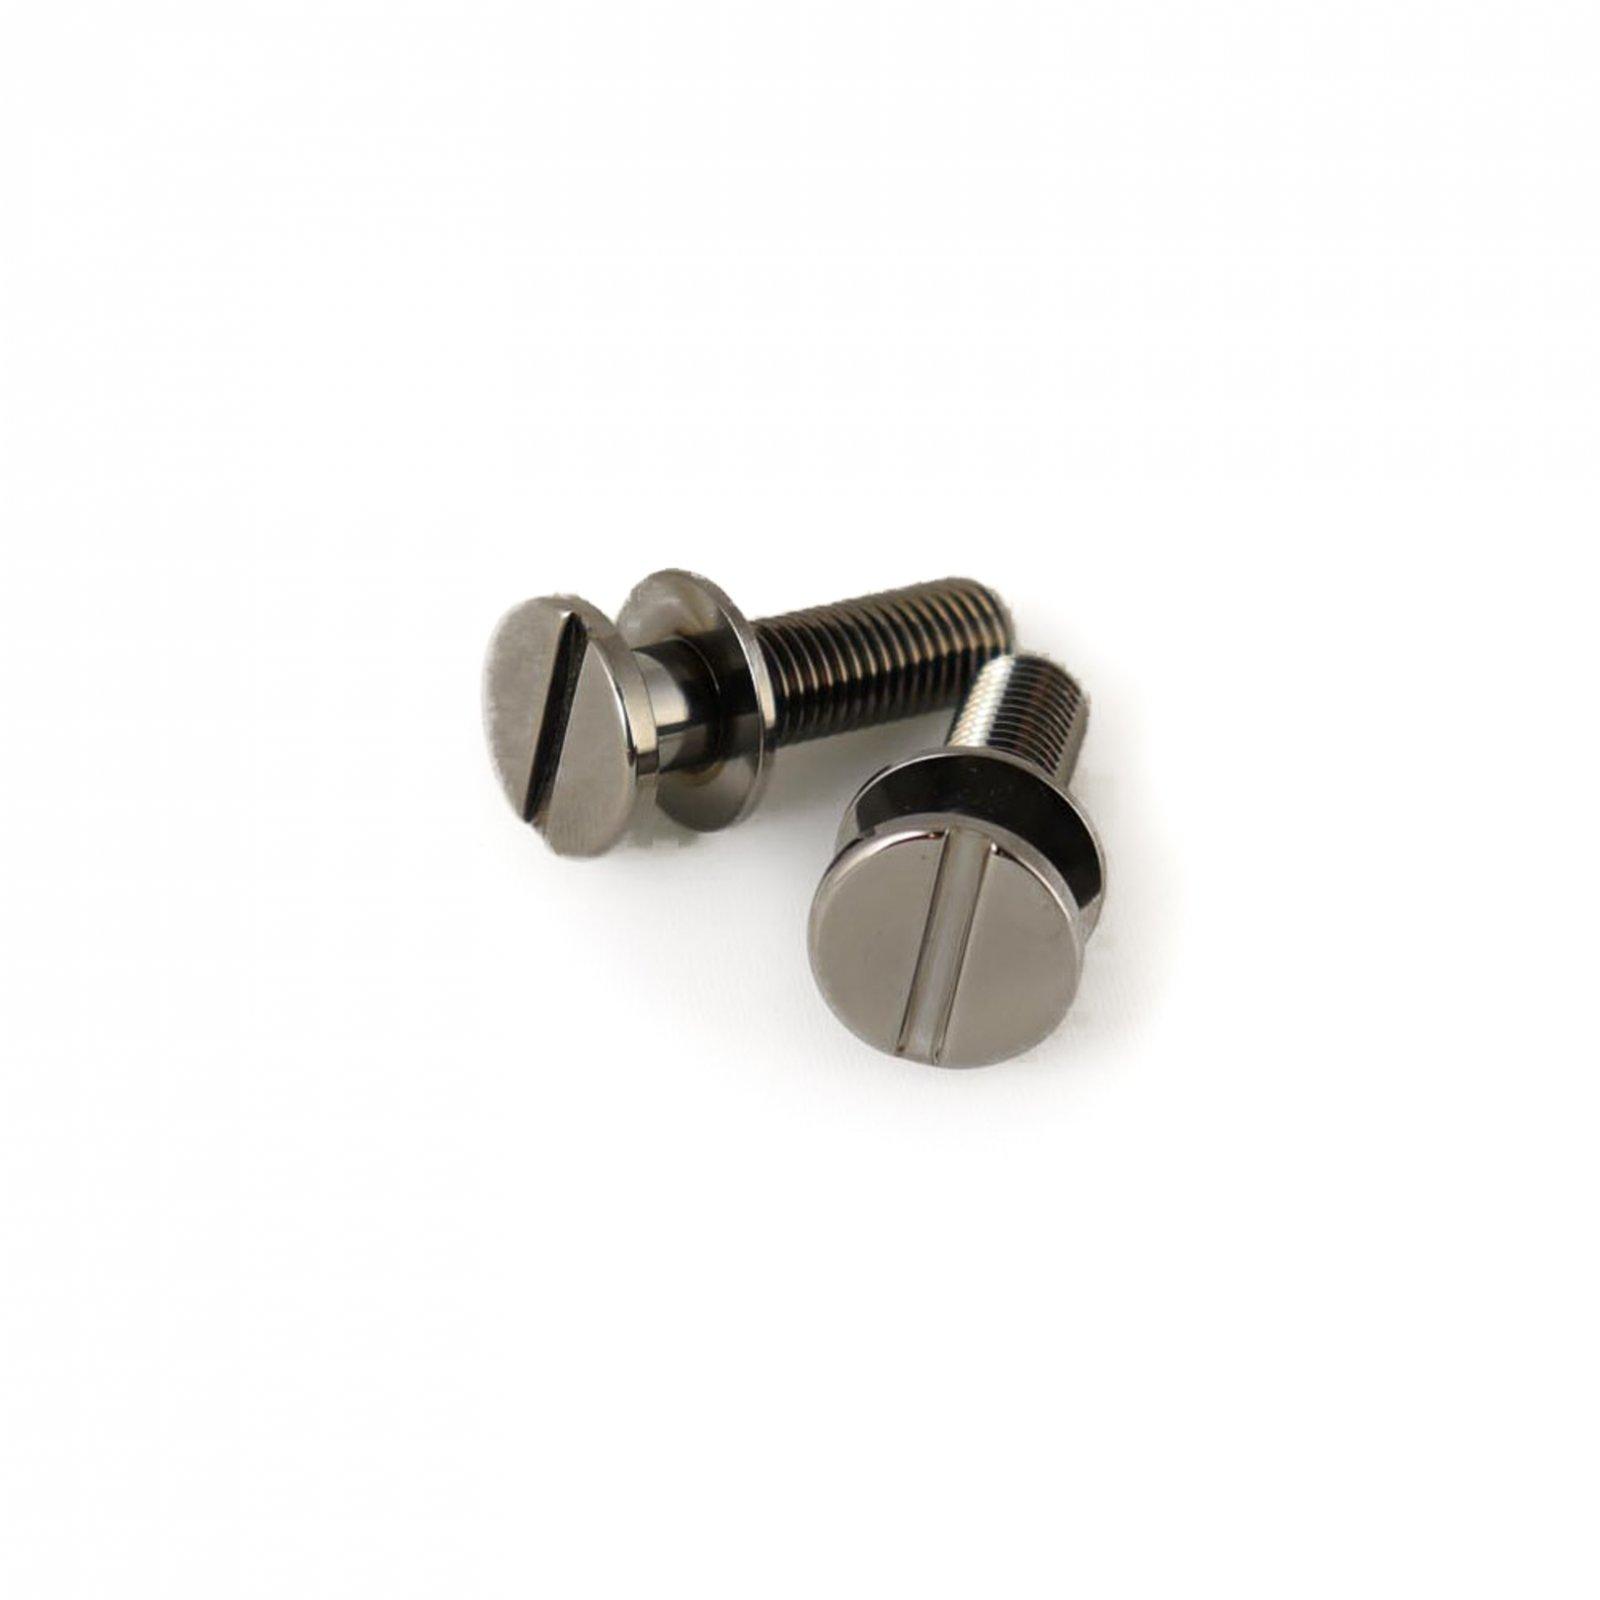 MannMade USA Stoptail Stud & Well set -  US Thread - Black Nickel